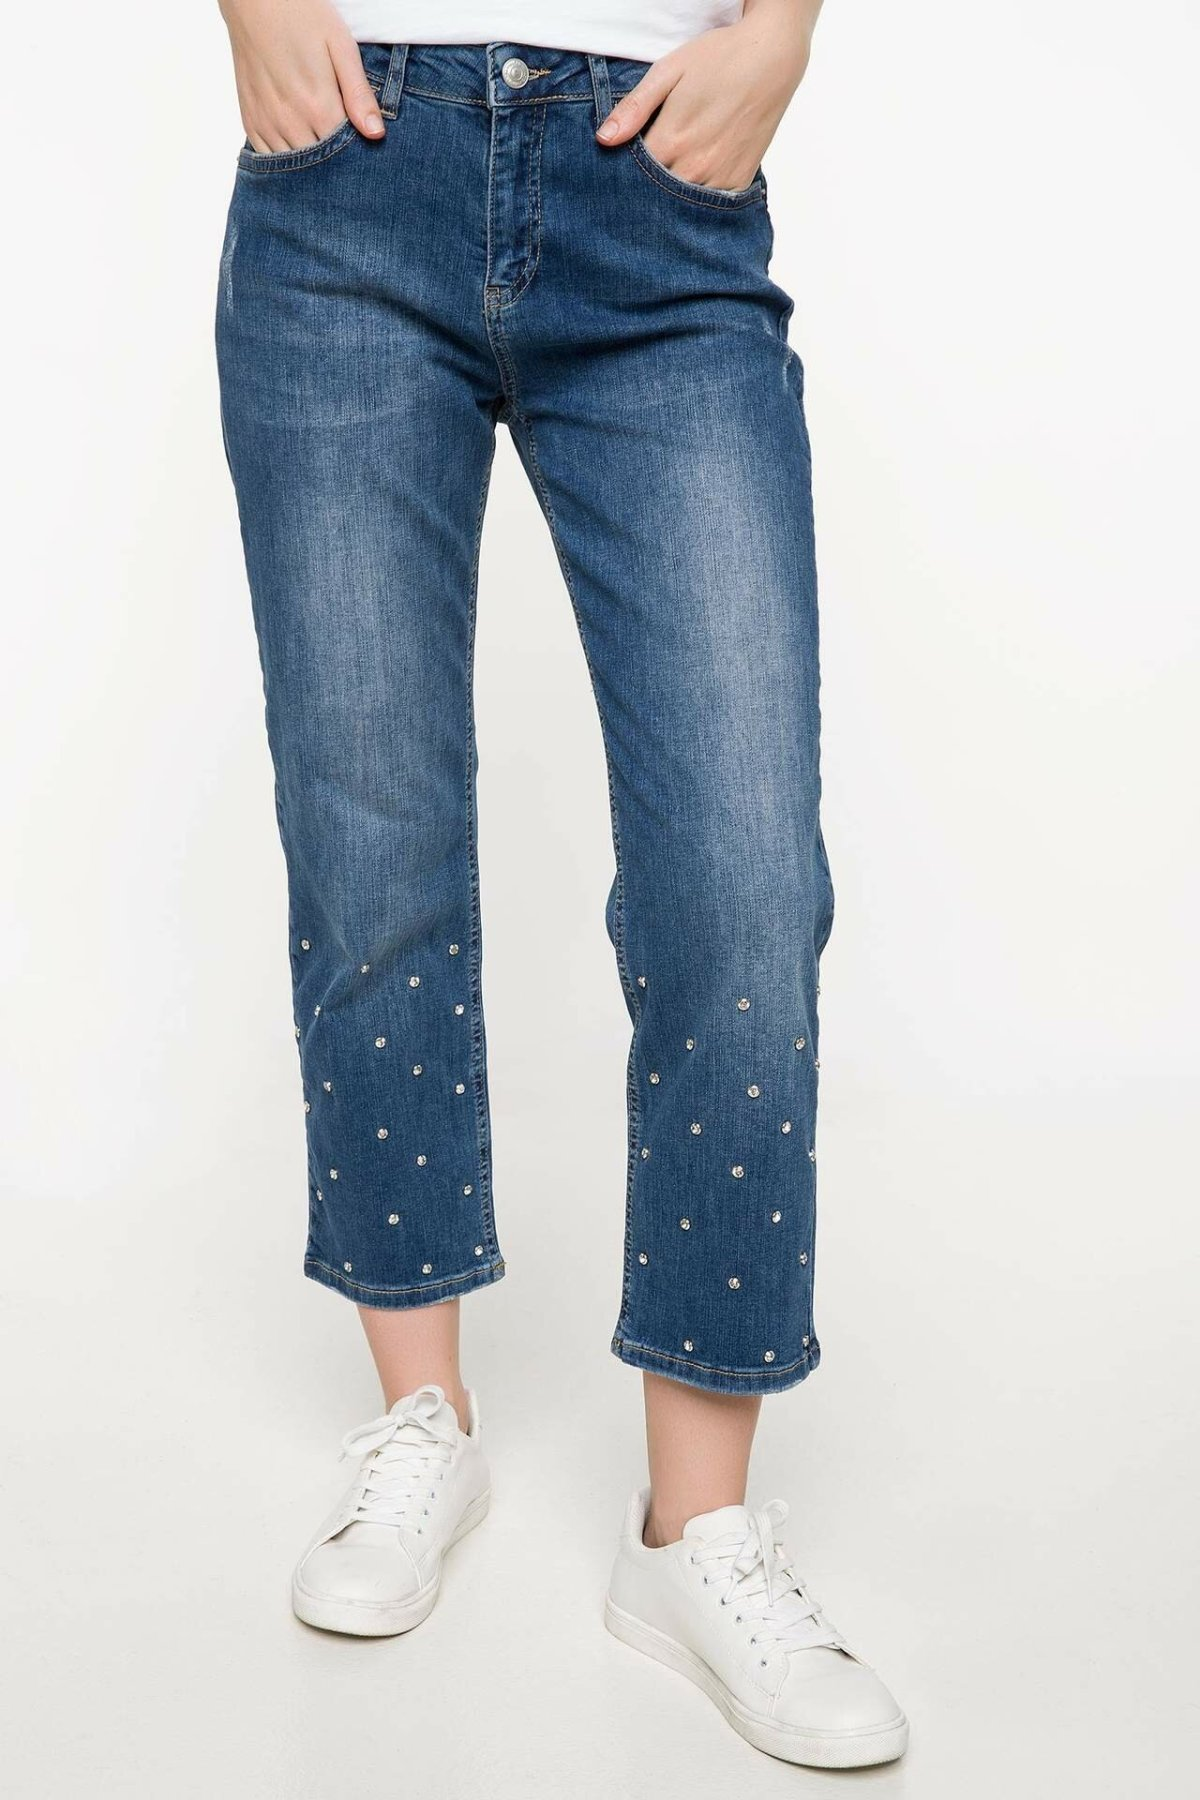 DeFacto Blue Women Loose Jeans Denim Casual Mid-waist  Female Beading Denim Stretch Simple Denim Trousers-J0458AZ18SM